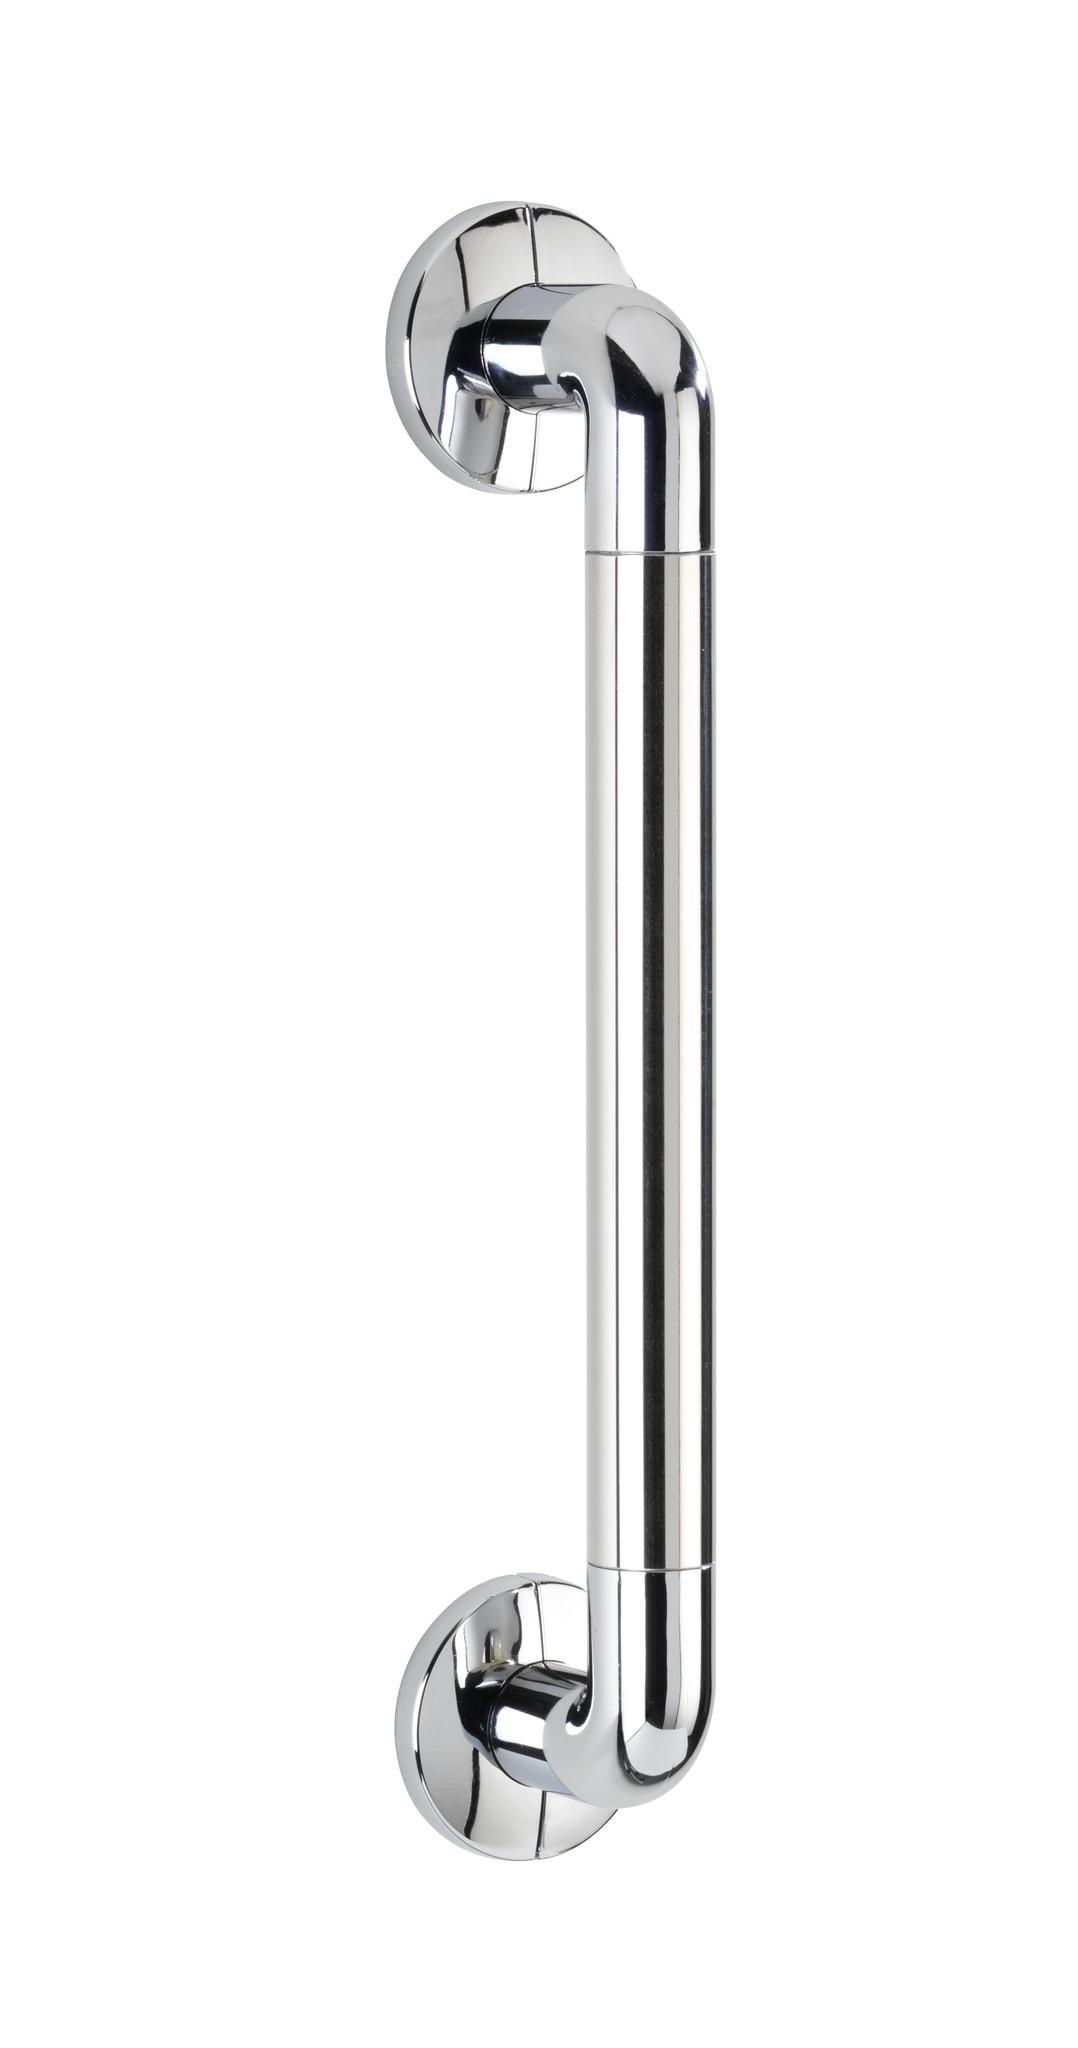 Wandhaltegriff Secura Chrom 43 cm